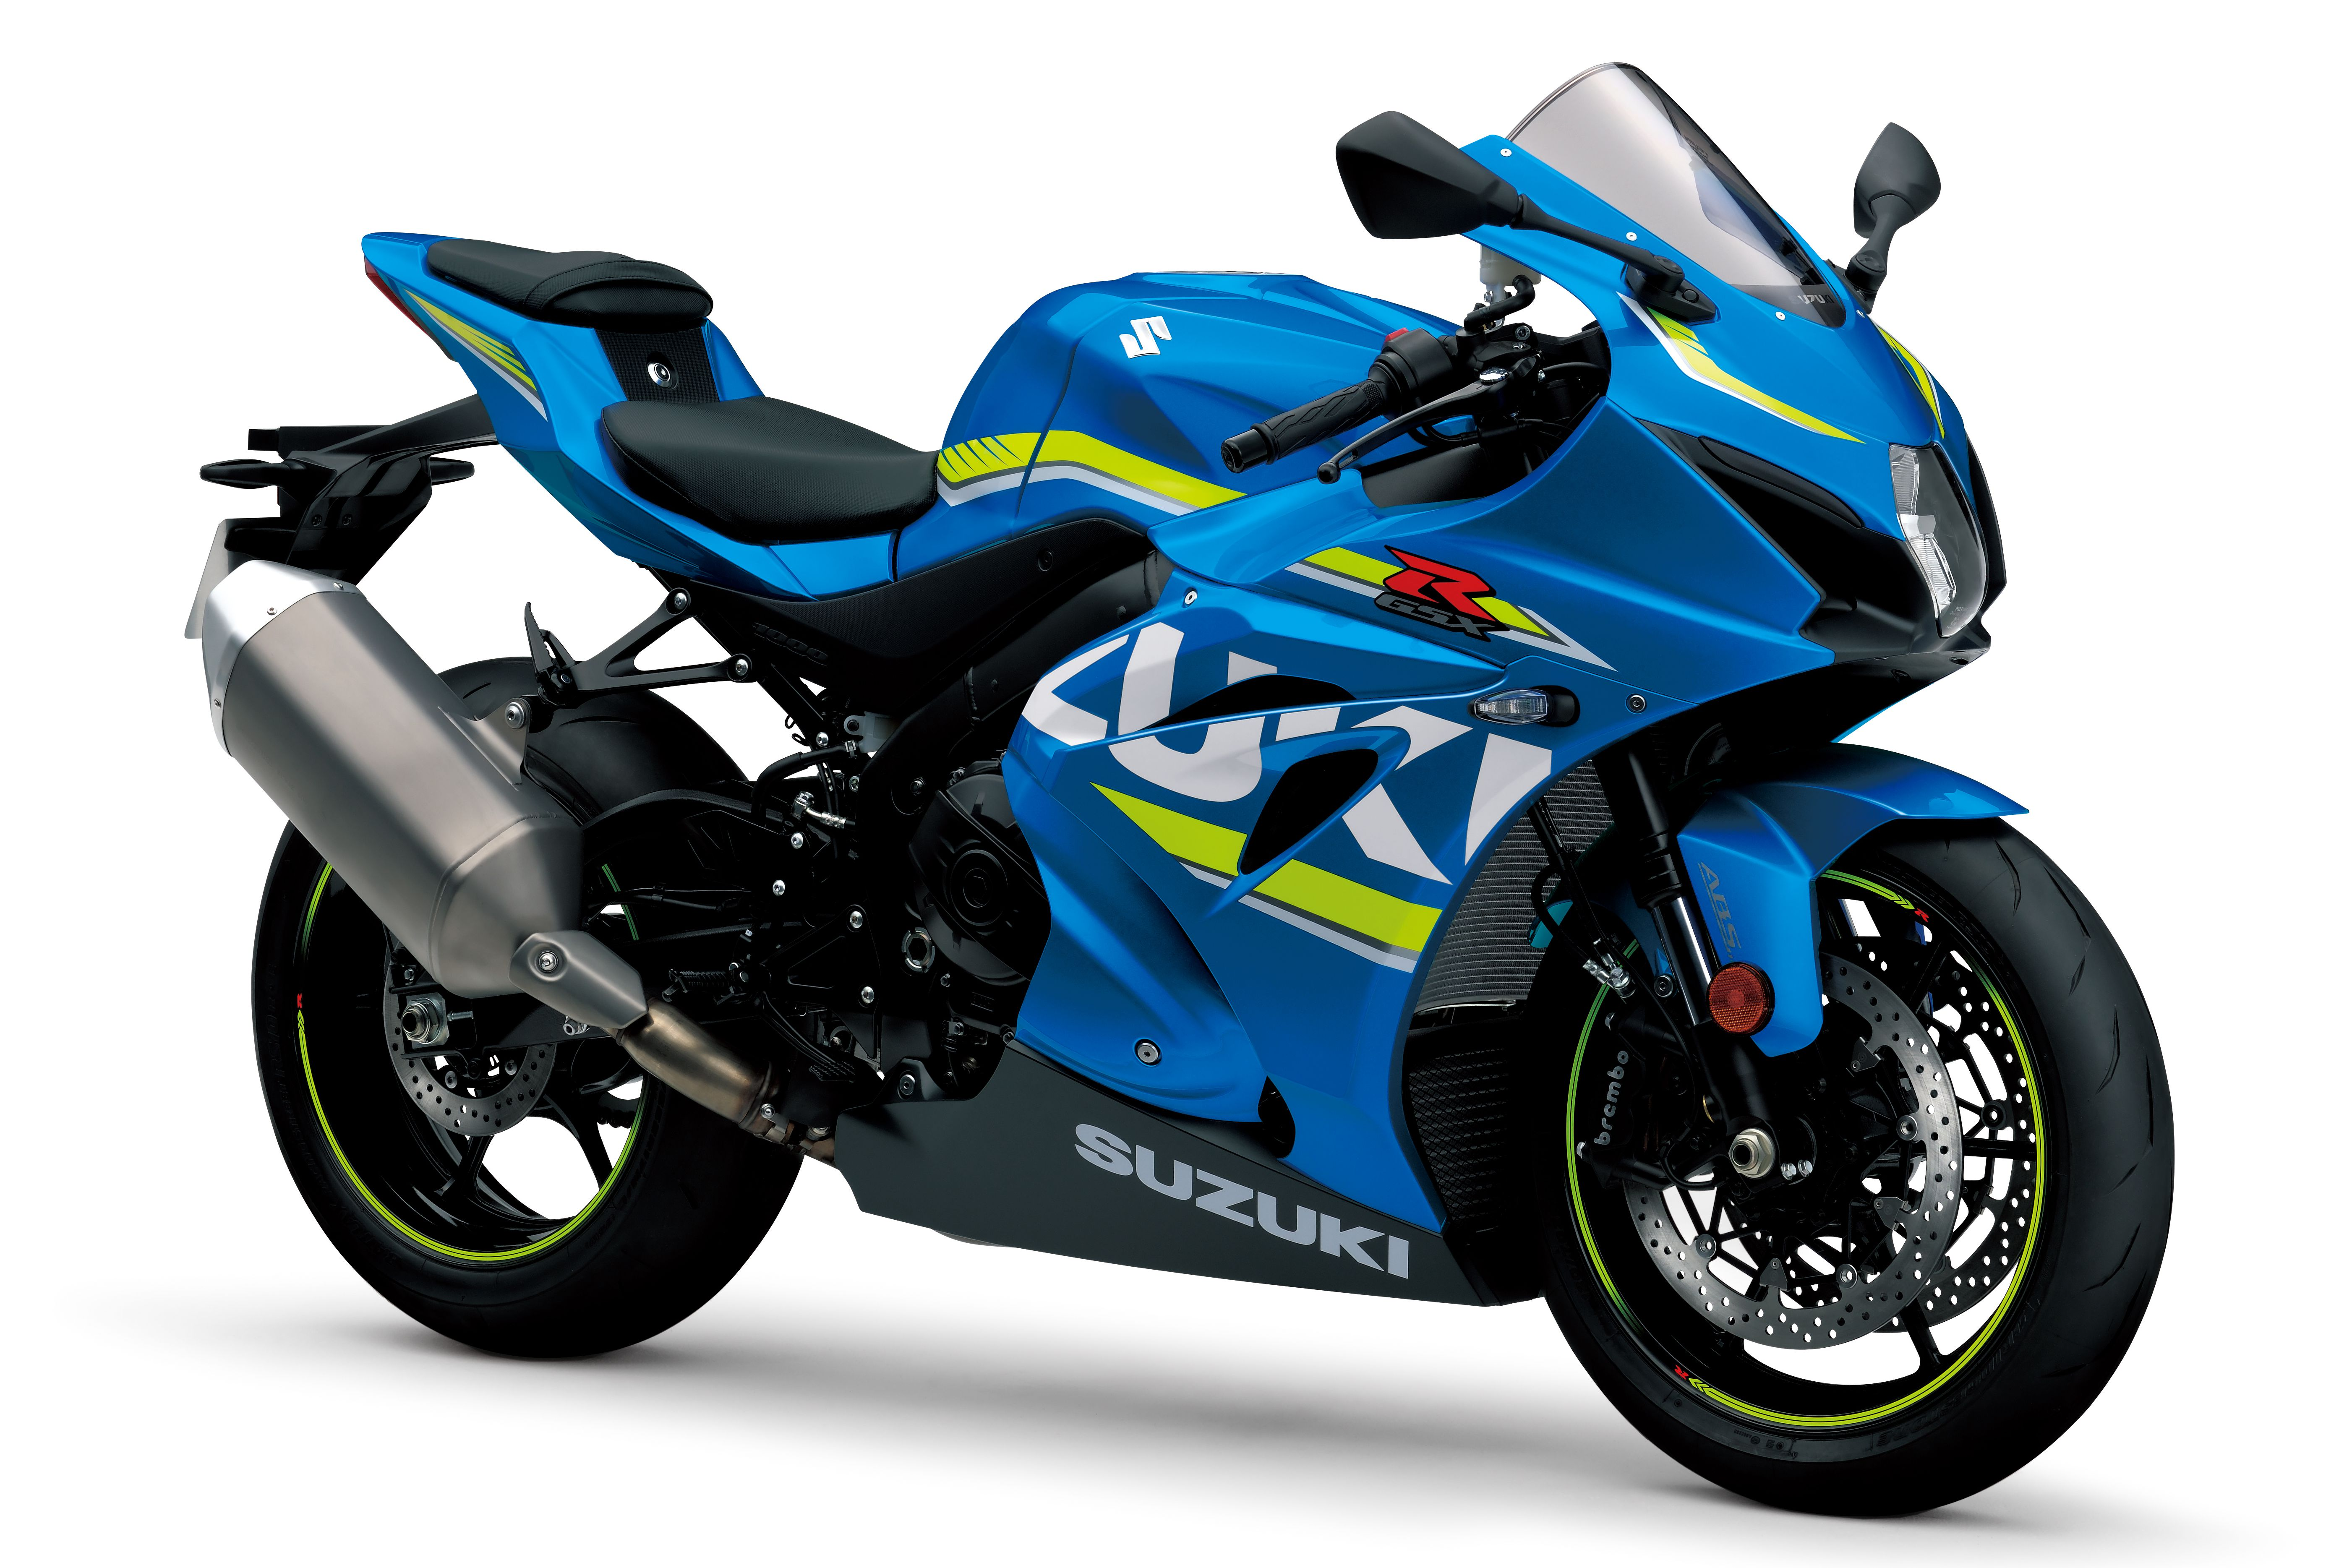 2017 suzuki gsx-r1000 | visordown